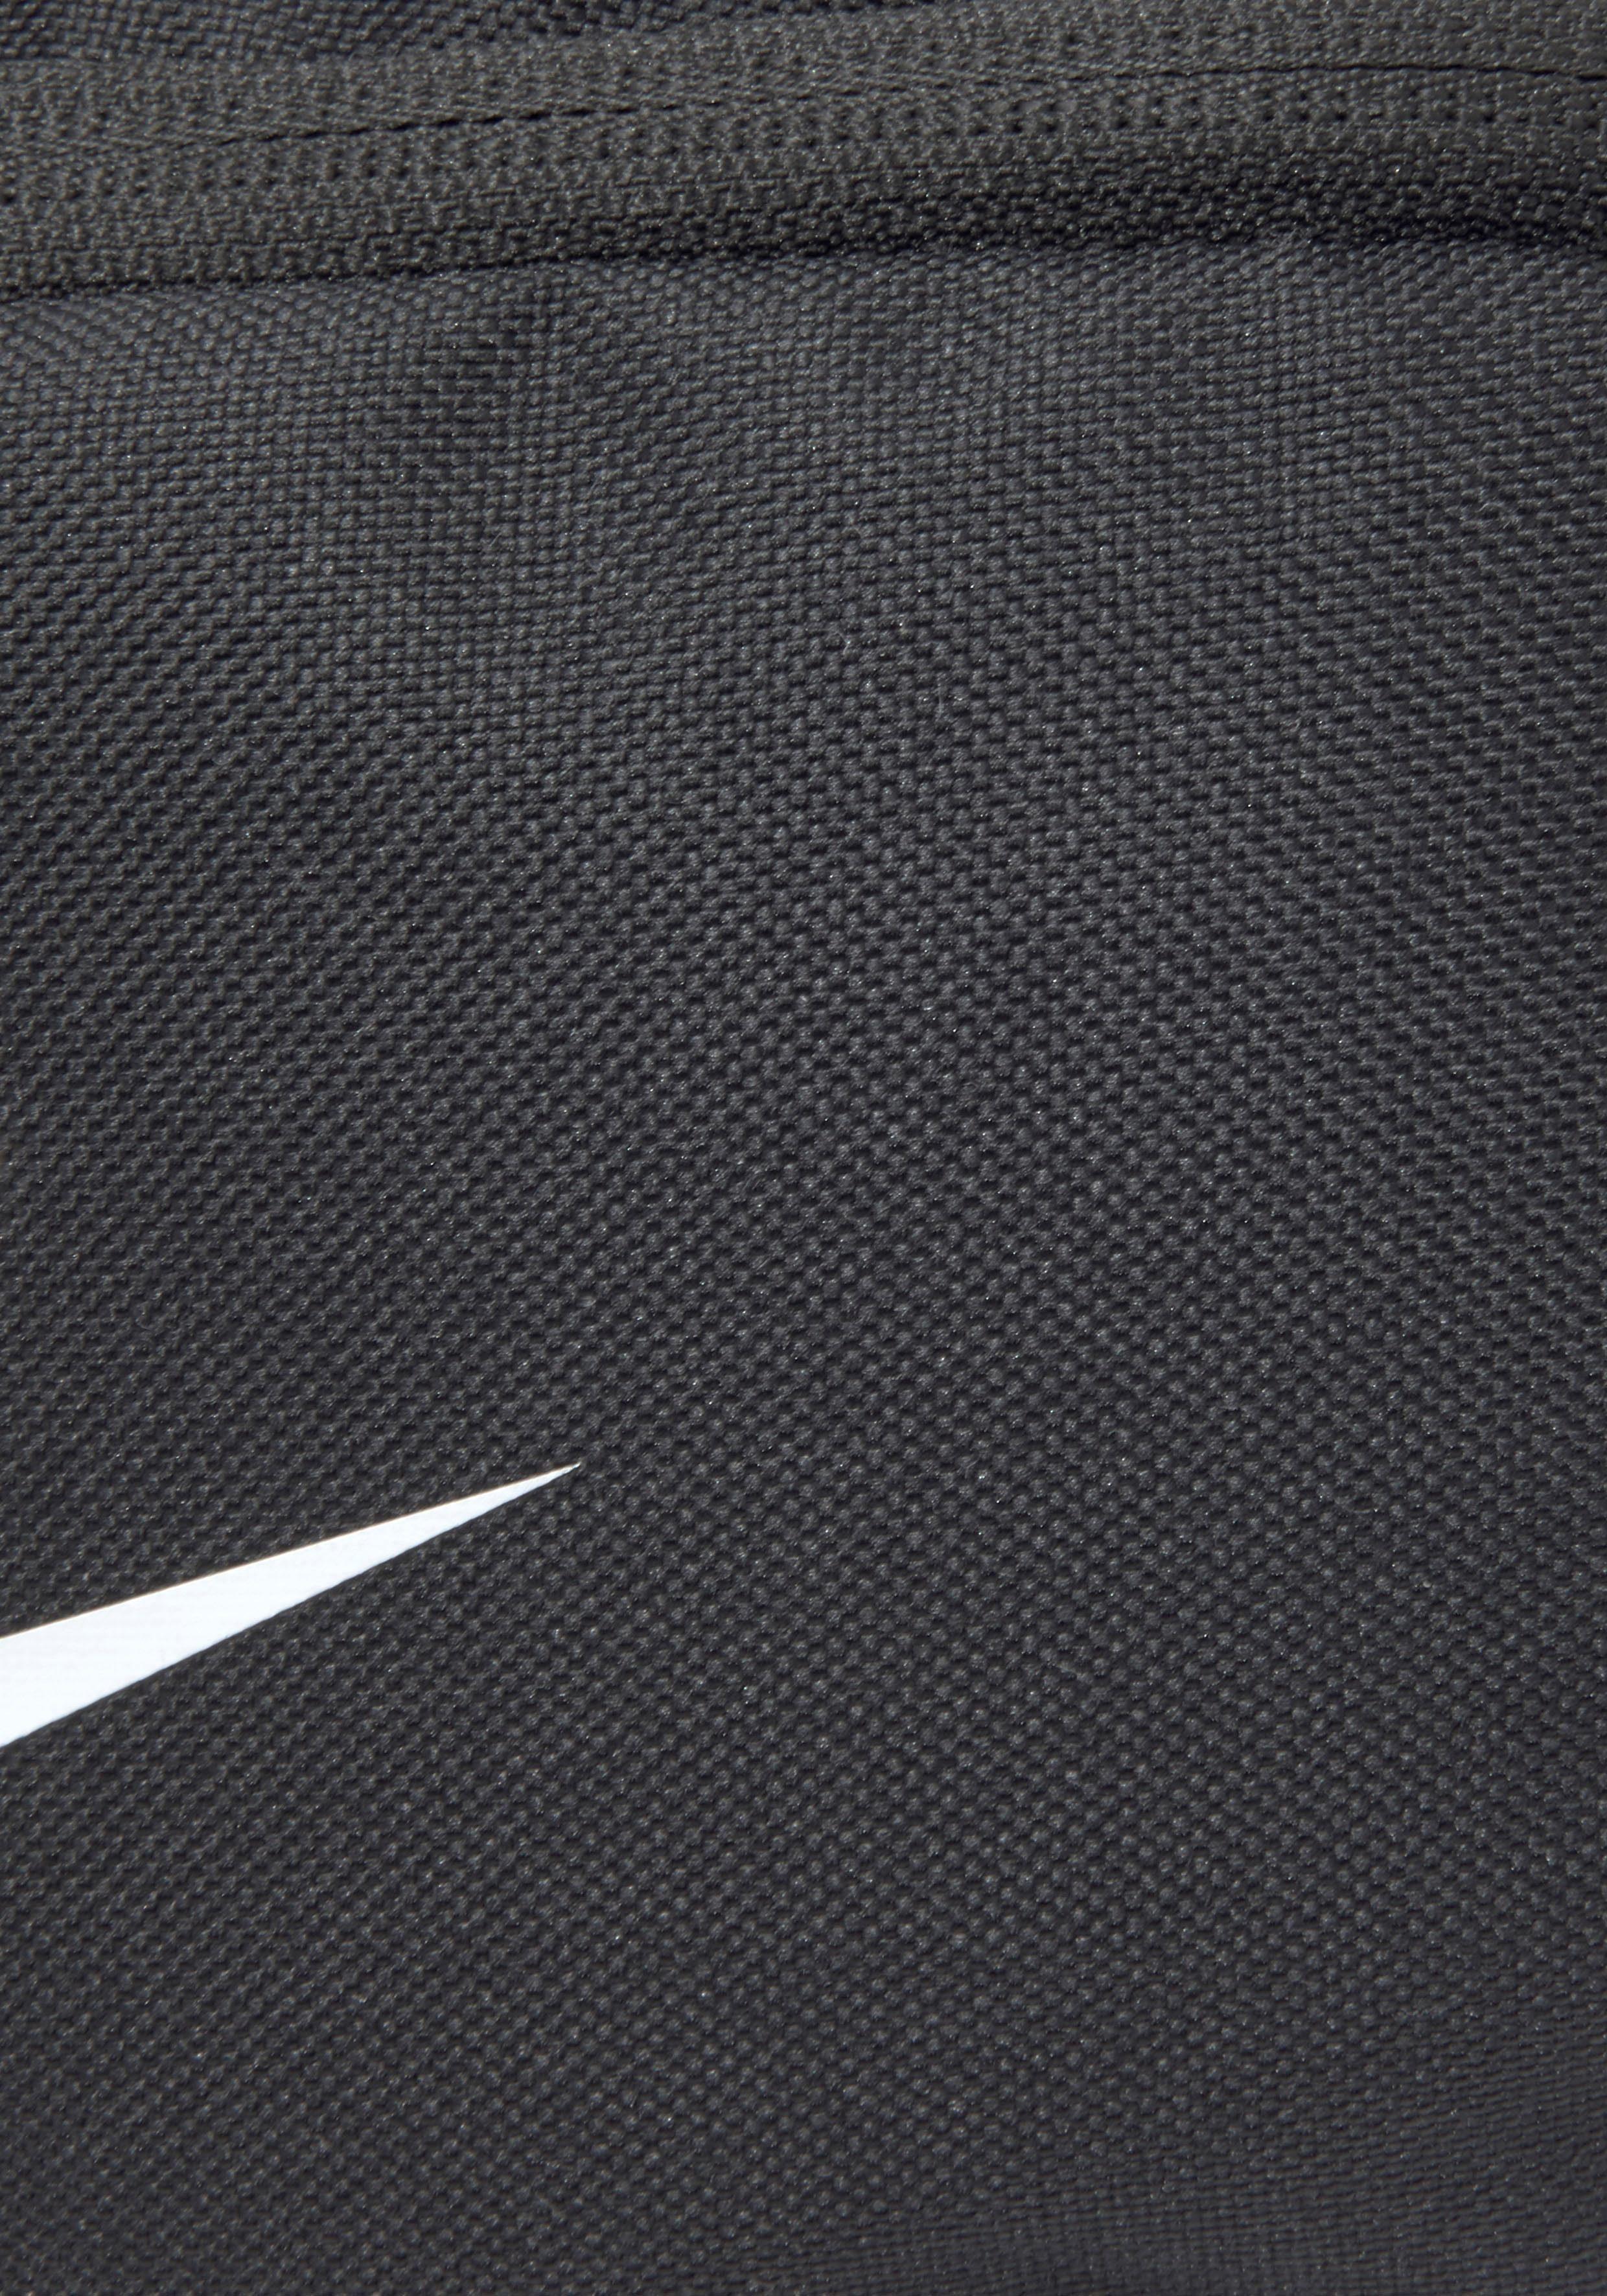 Hip Heritage »nk Gürteltasche Pack« Sportswear Nike qwxTCIE